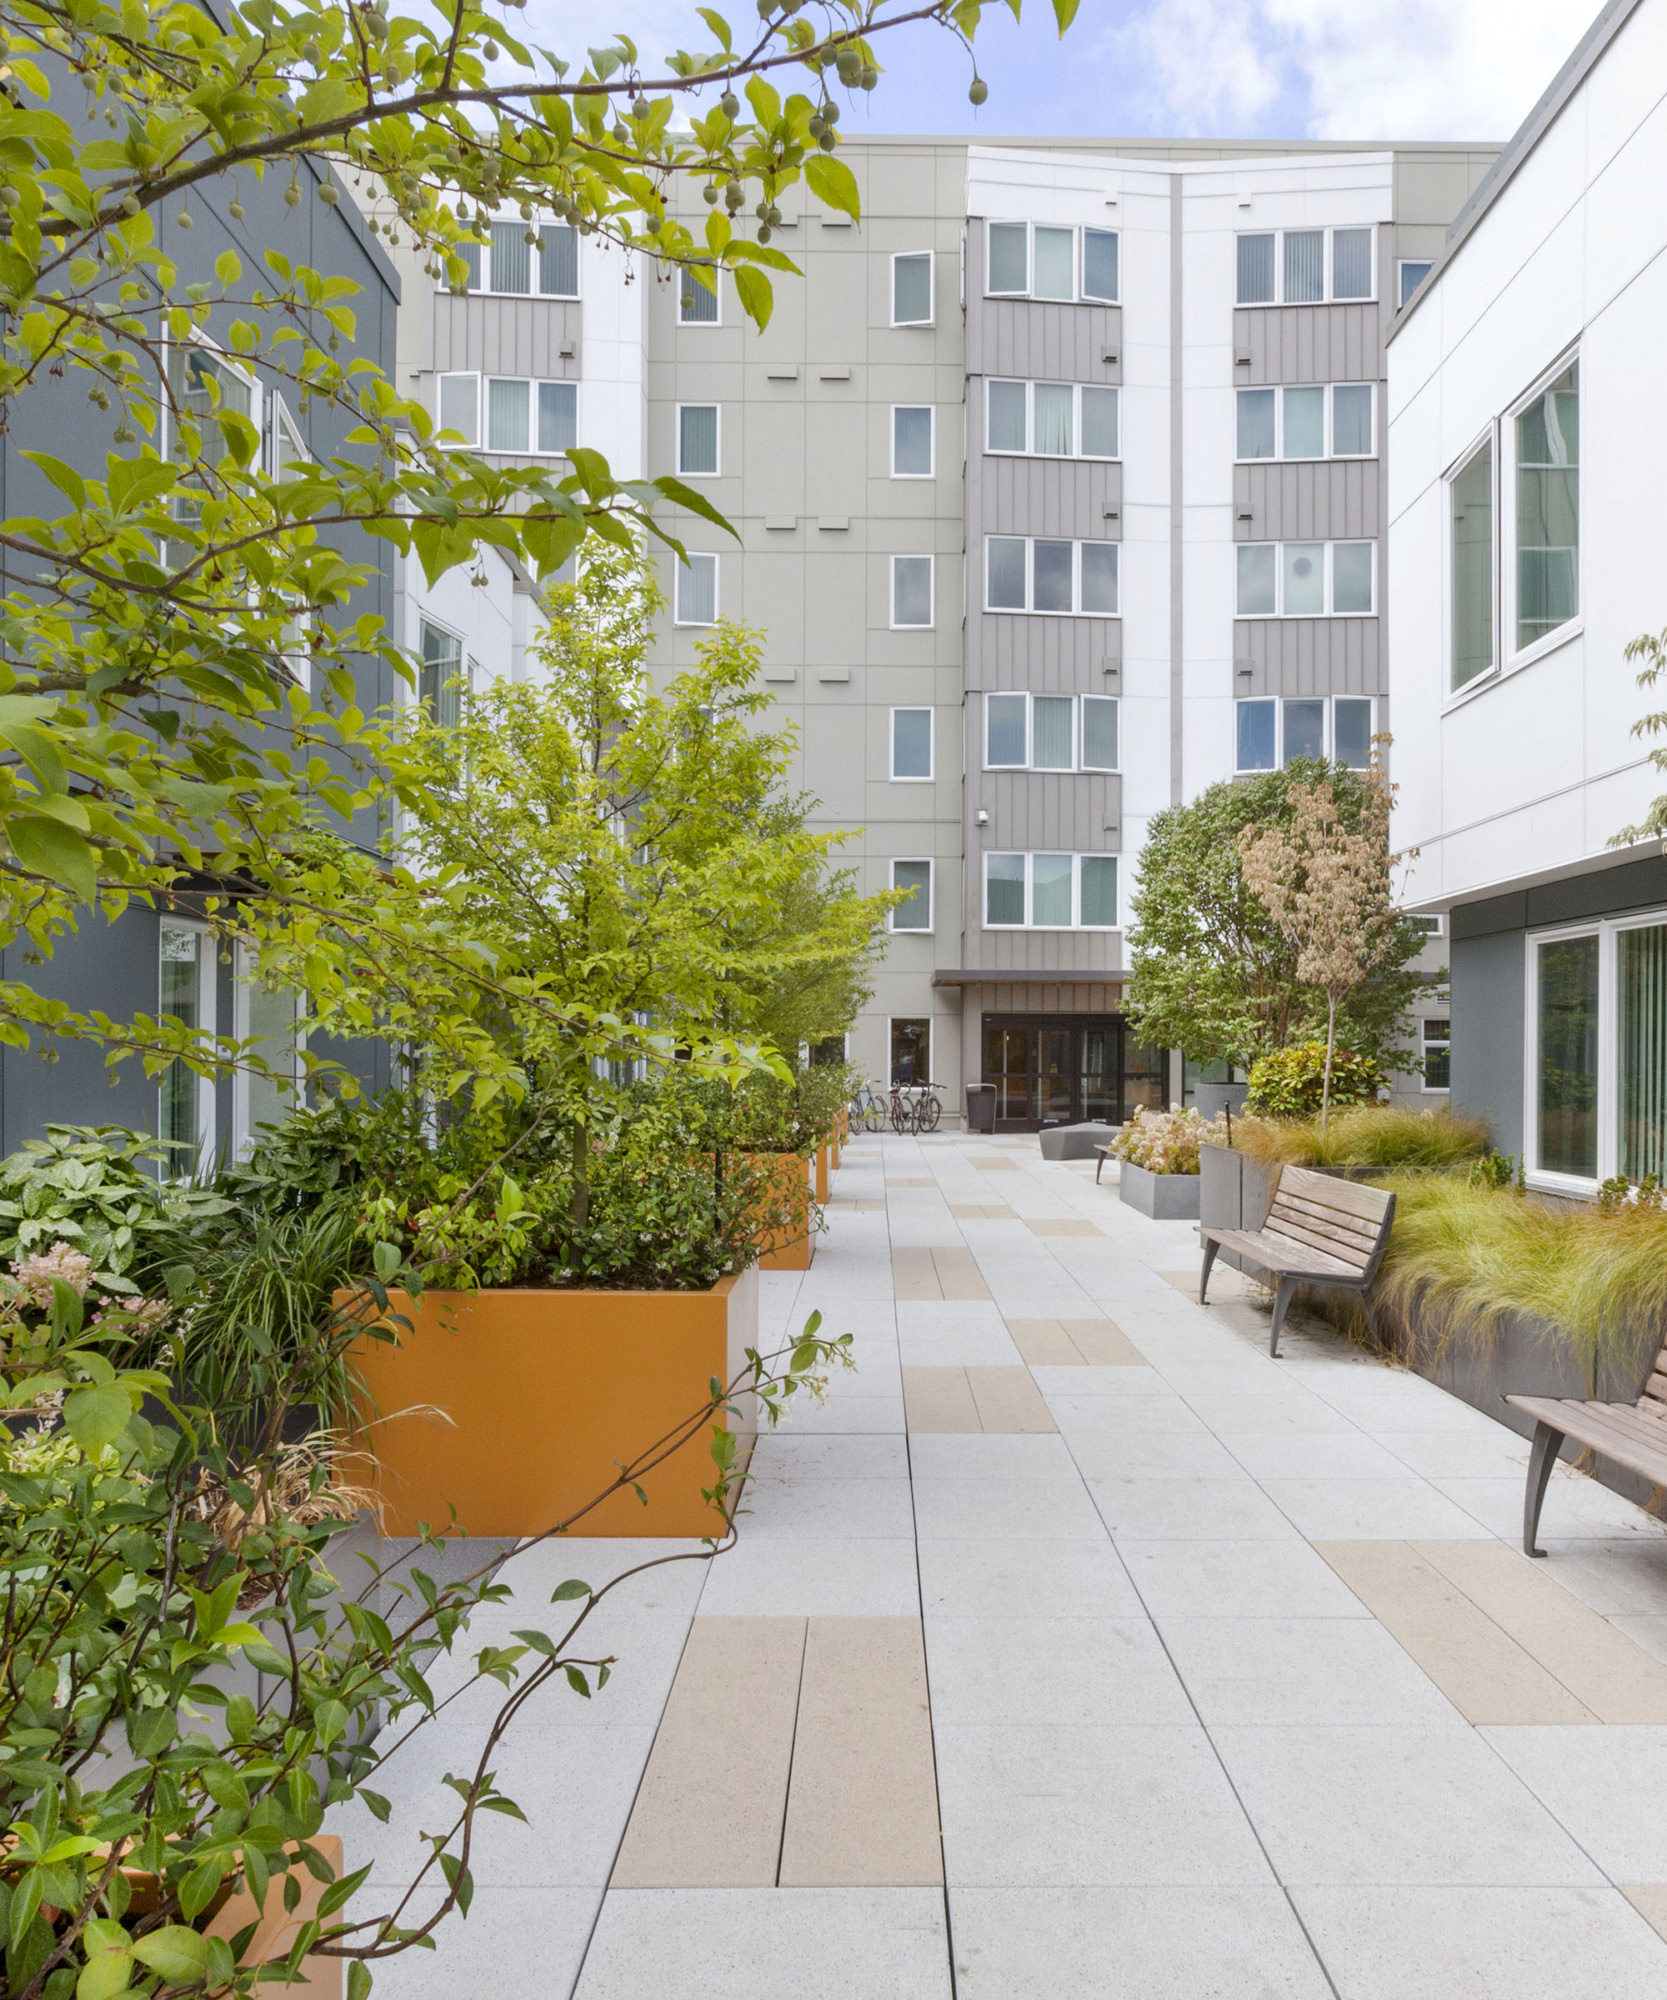 Raven Terrace courtyard